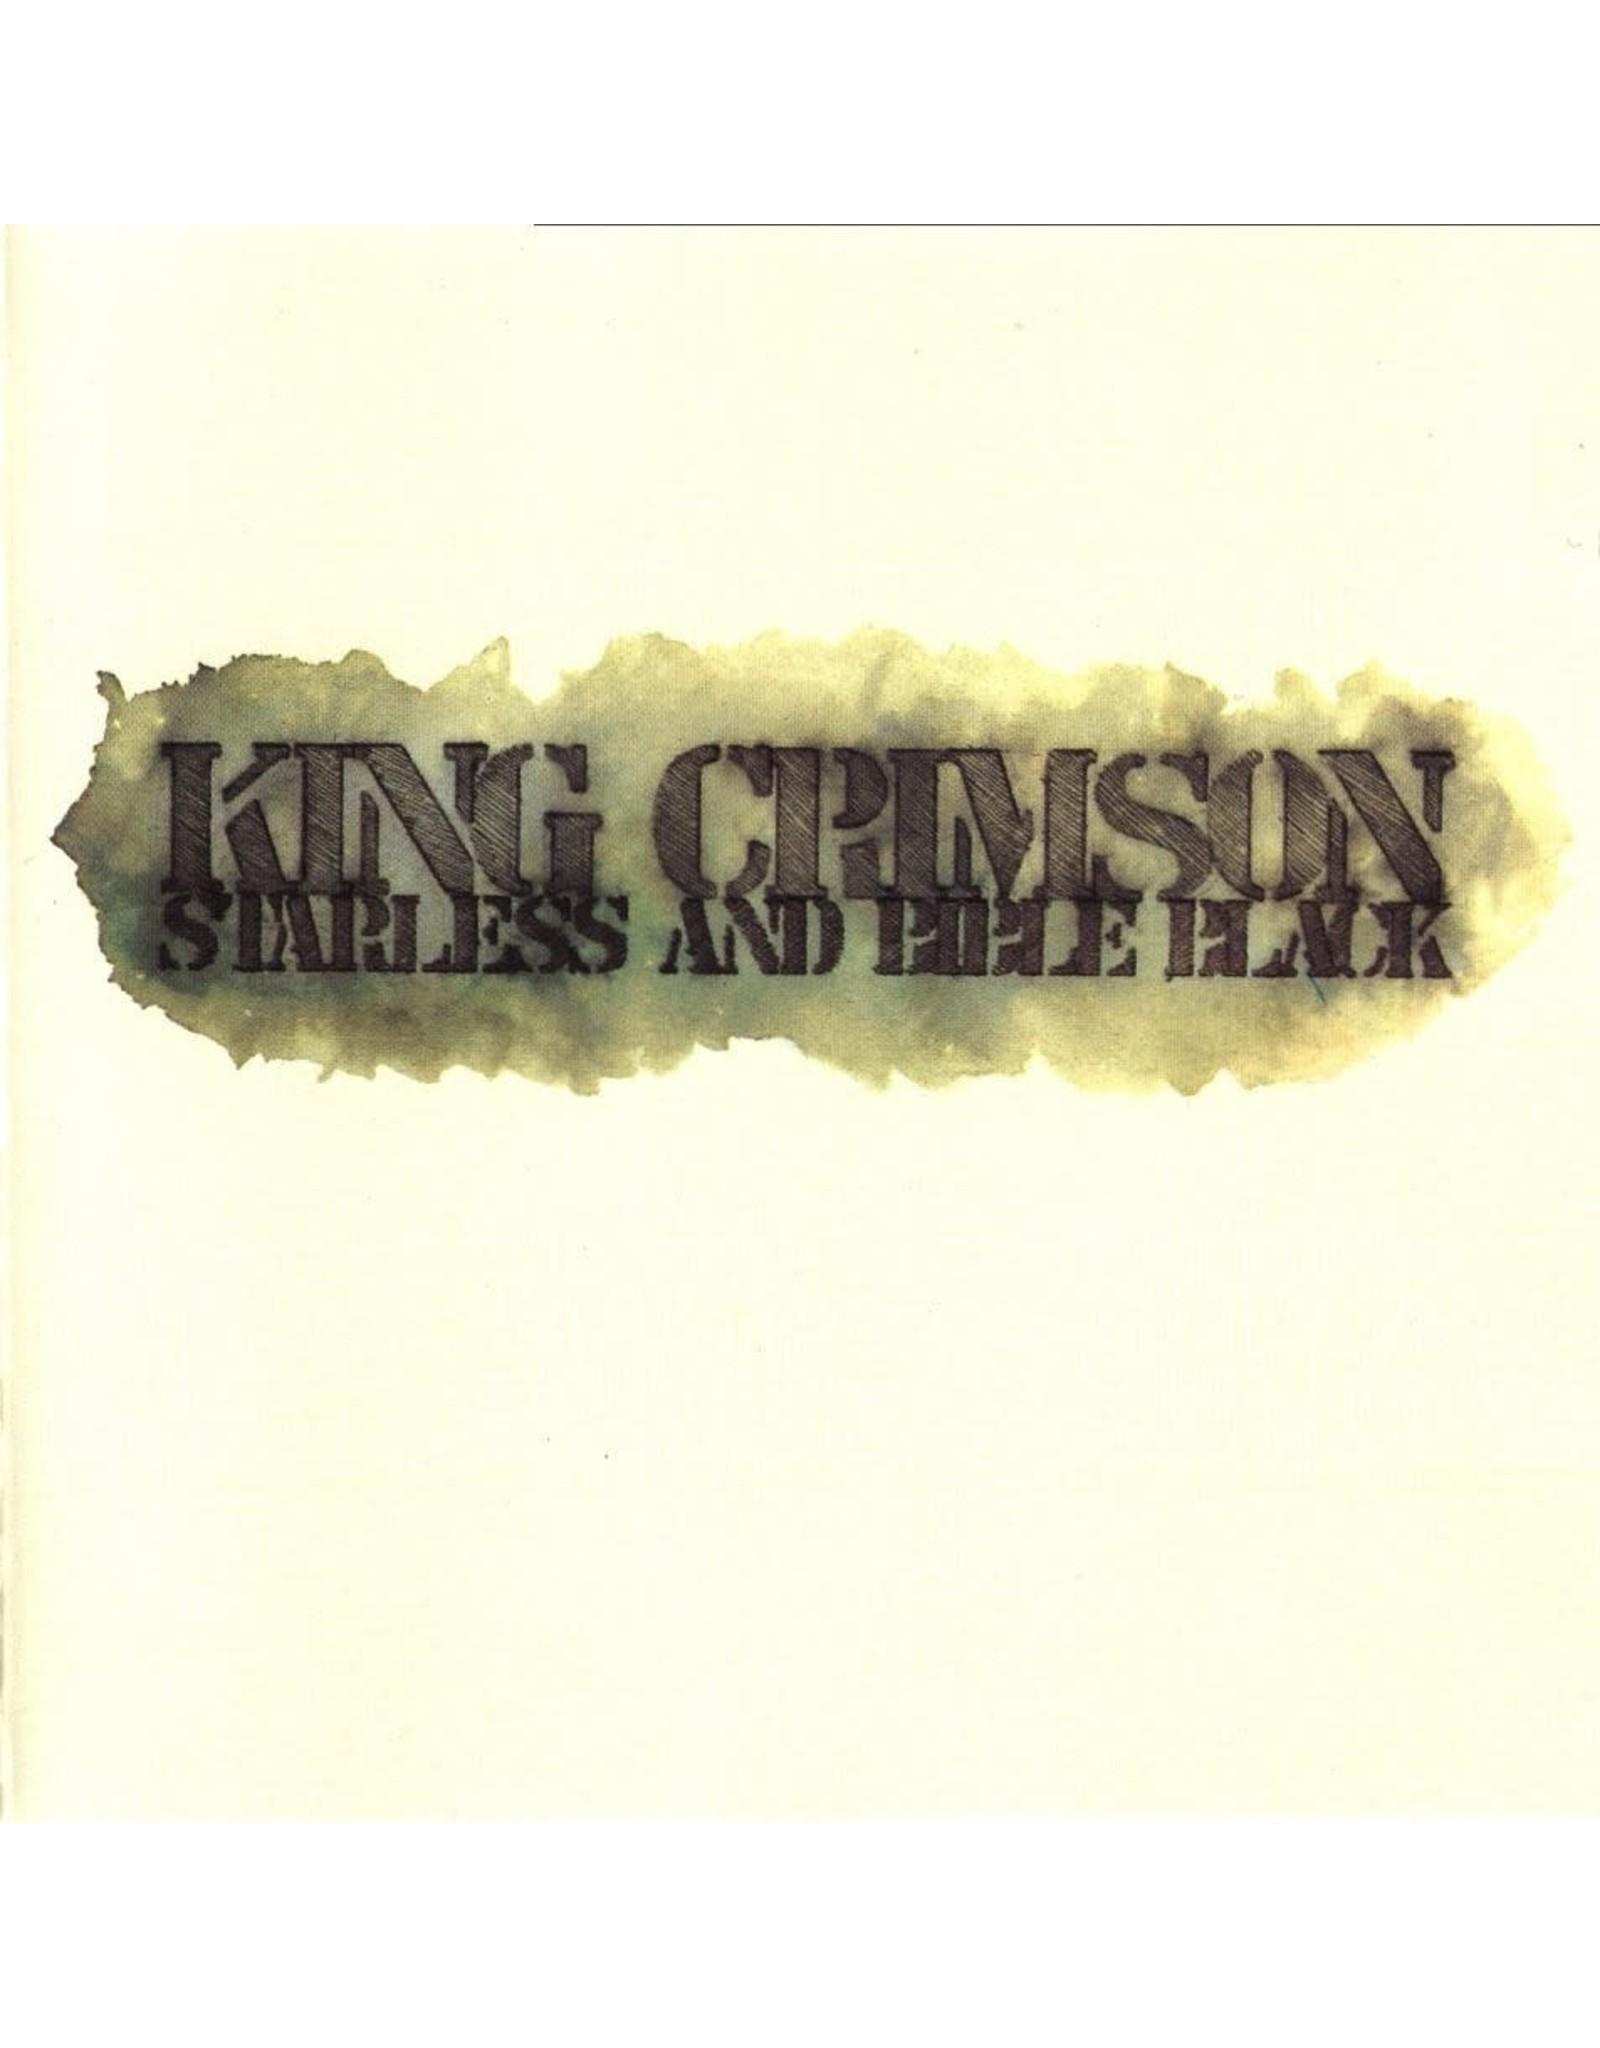 Vinyl King Crimson - Starless And Bible Black